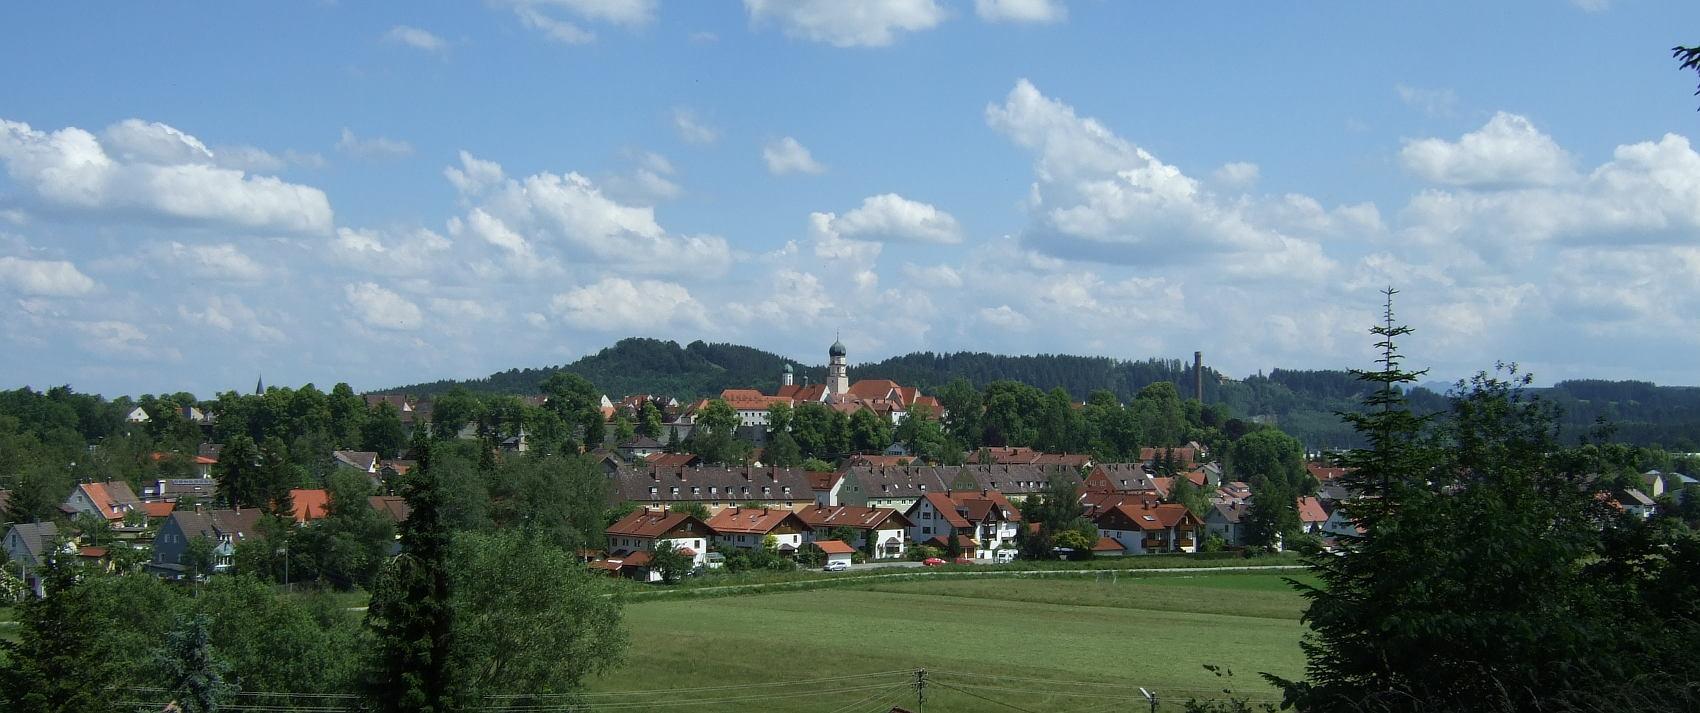 Fahrrad-Tour Schongau - Peiting - Wieskirche